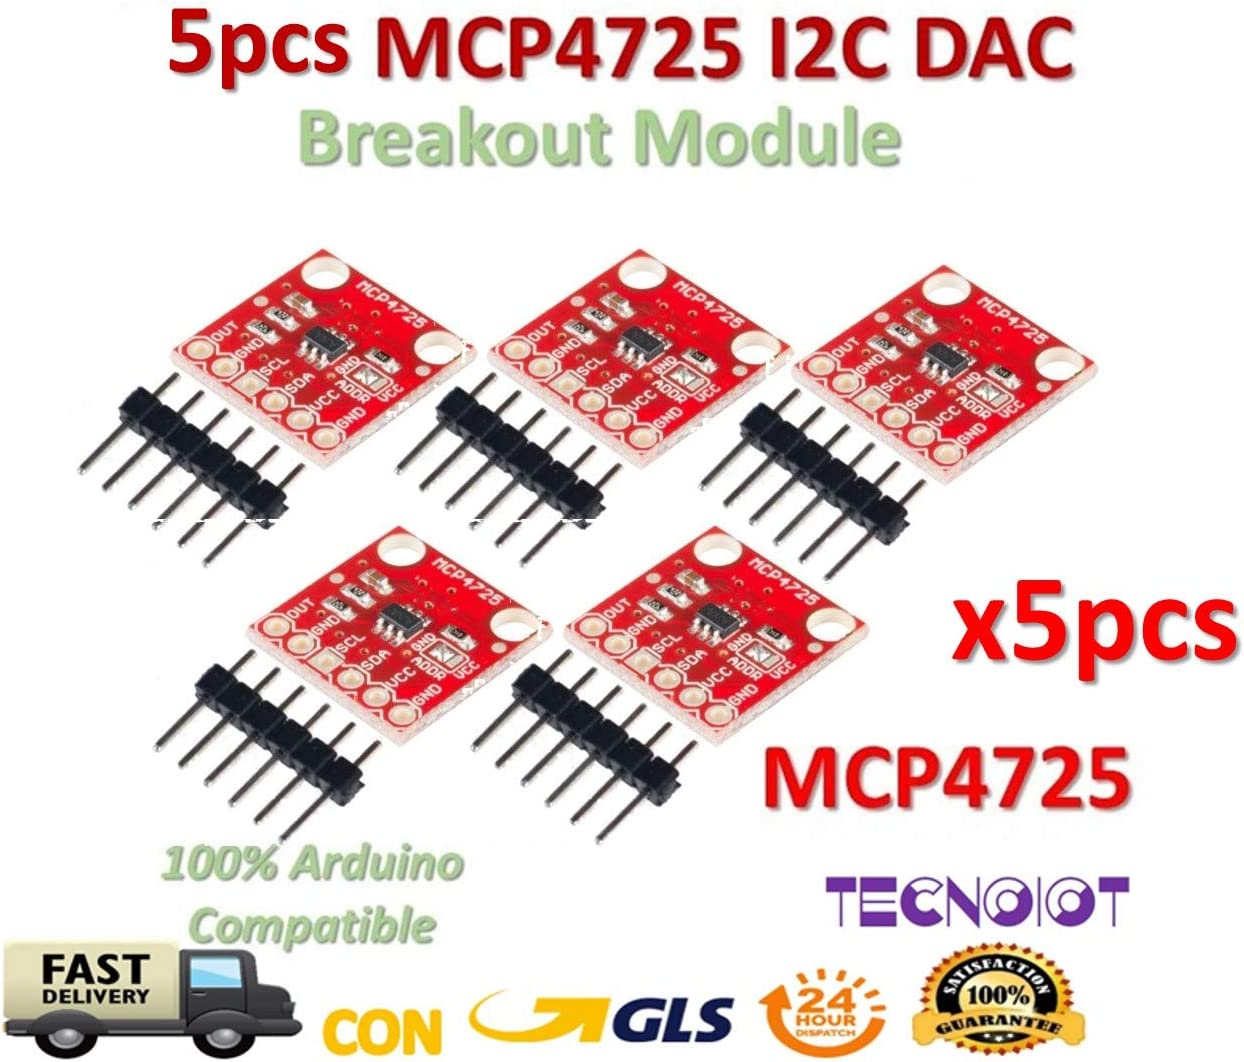 I2C MCP4725 DAC Breakout Development Board module 12Bit Resolution